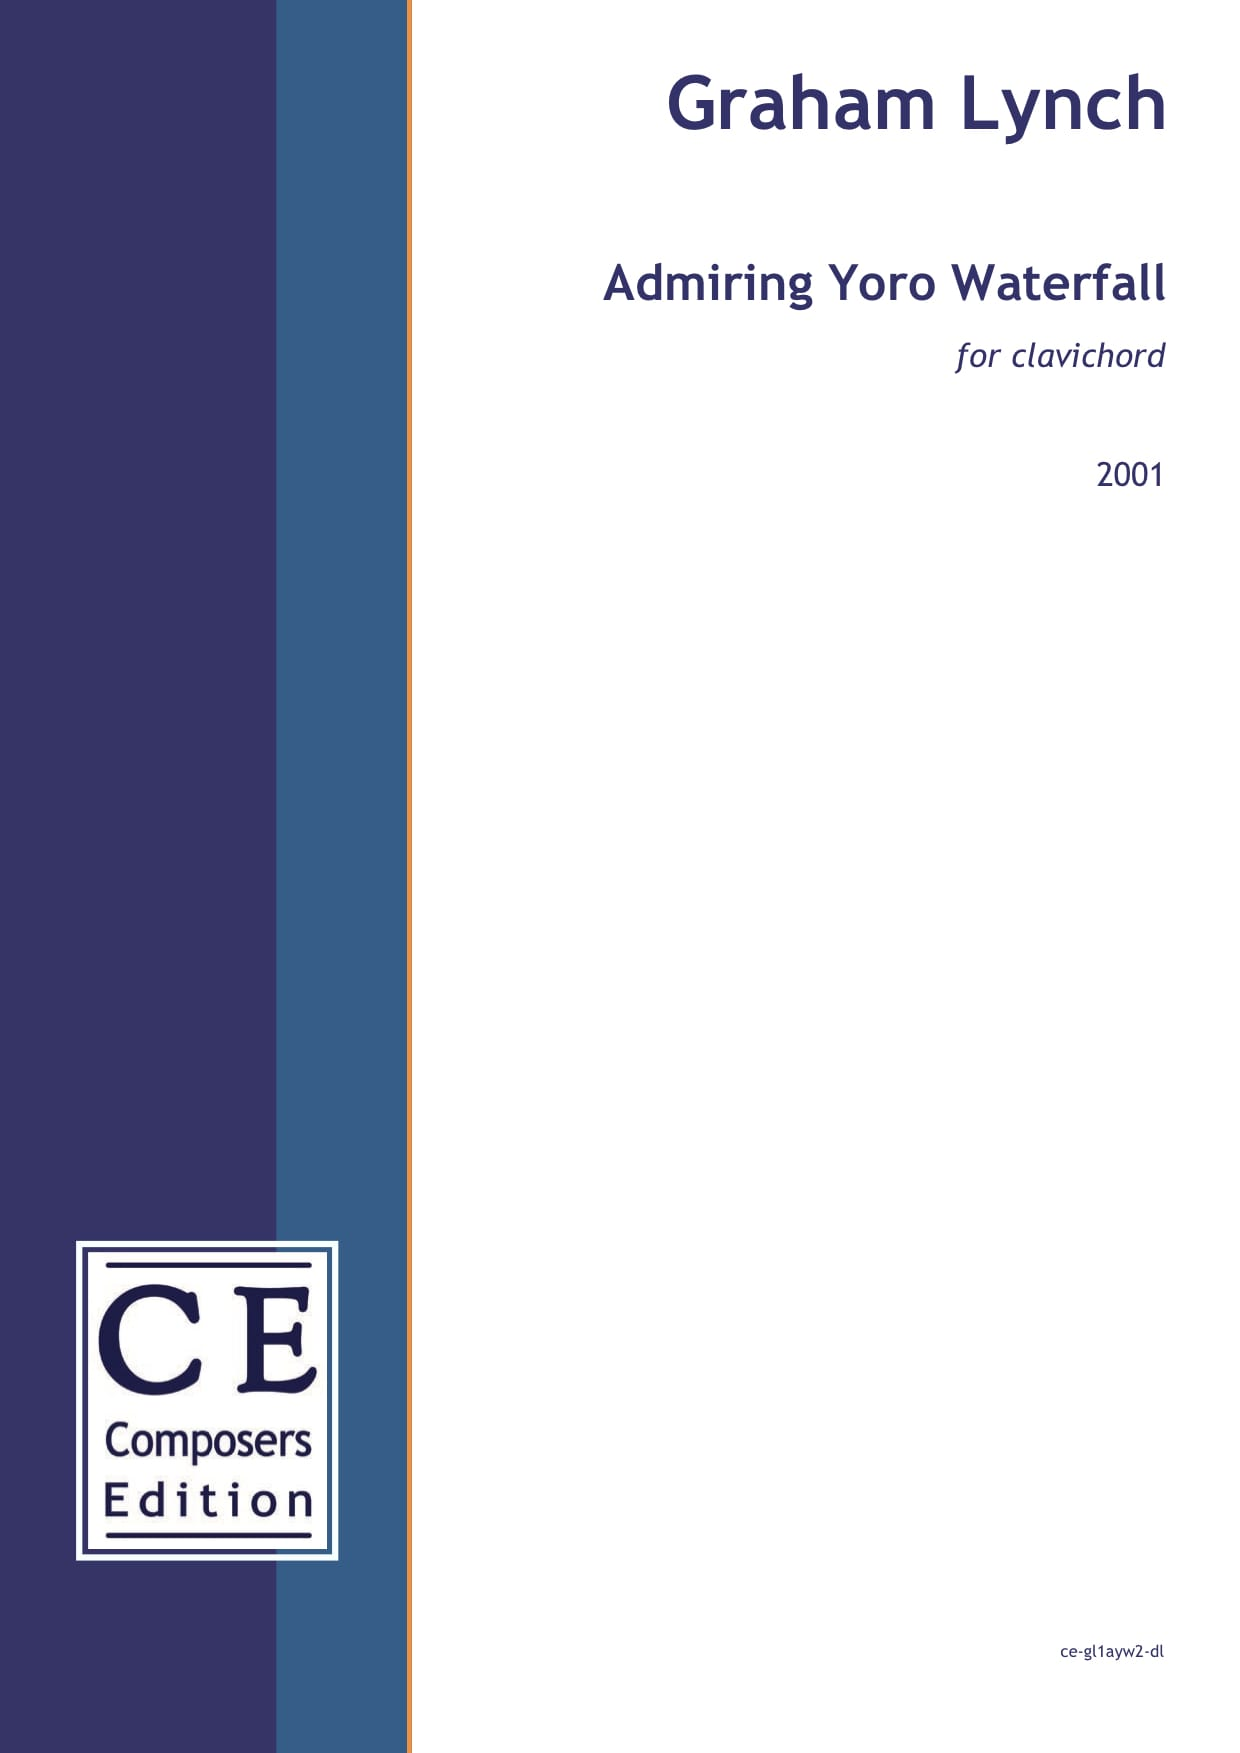 Graham Lynch: Admiring Yoro Waterfall (clavichord version) for clavichord